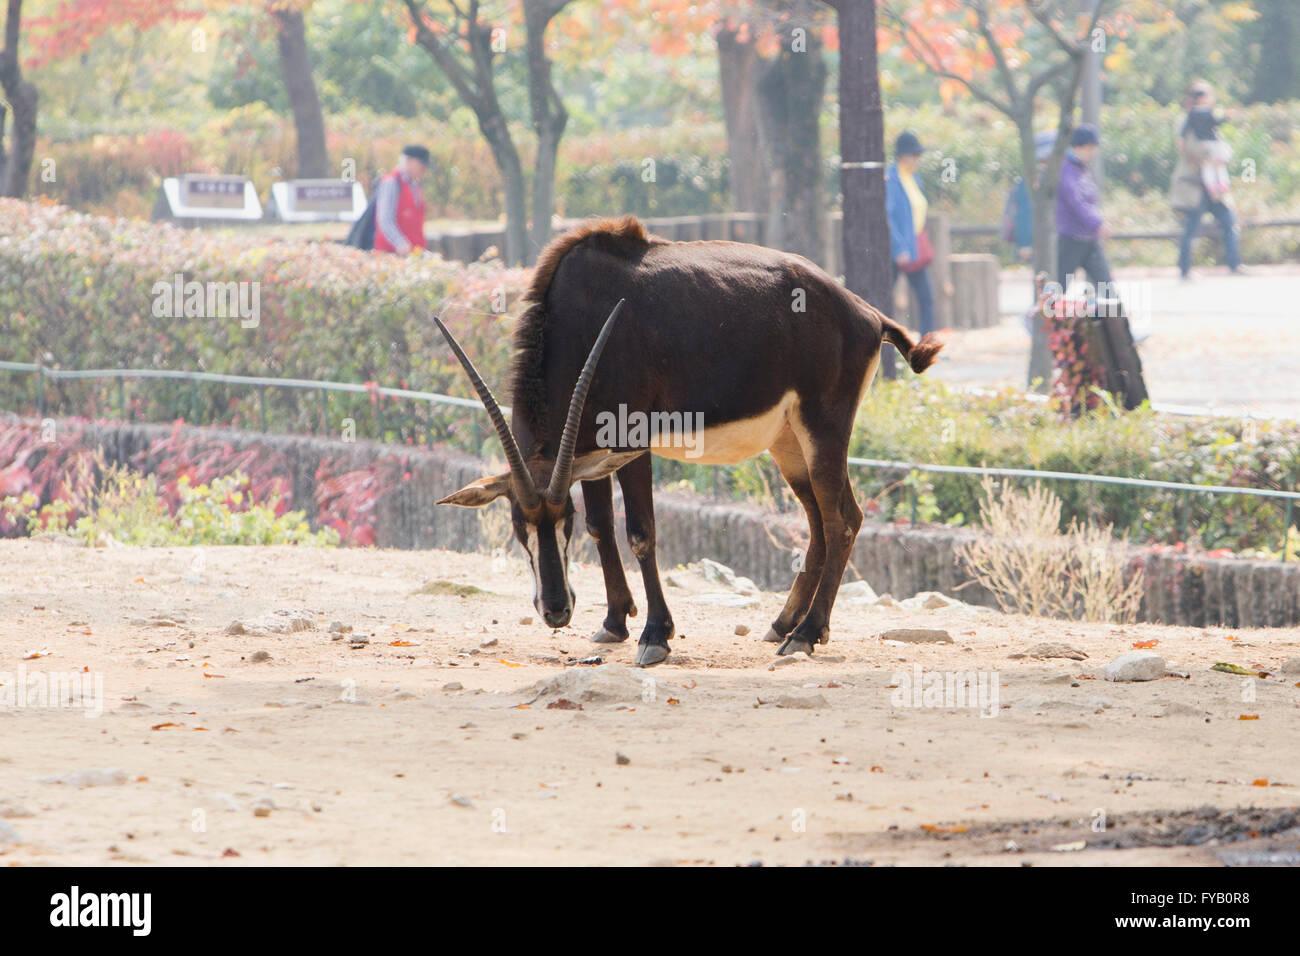 Animals 075 - Stock Image